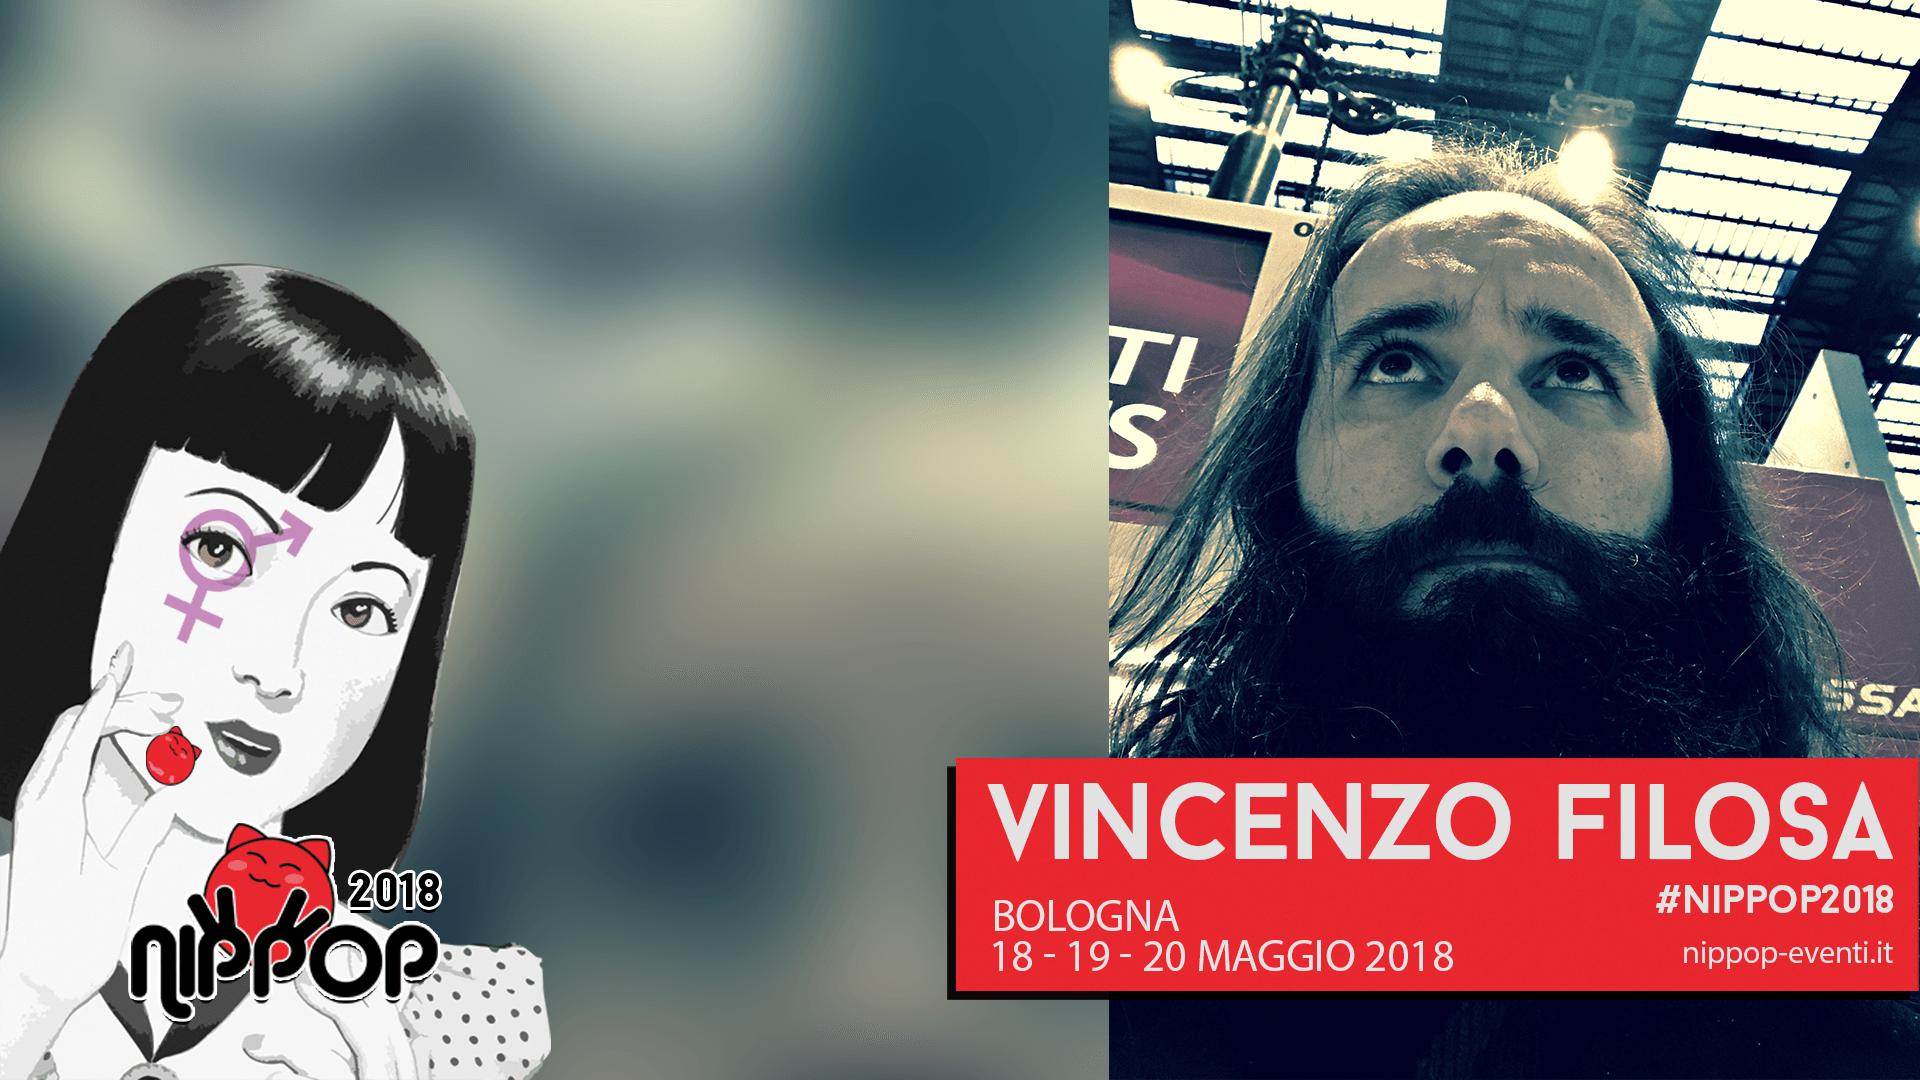 vincenzo filosa nippop 2018